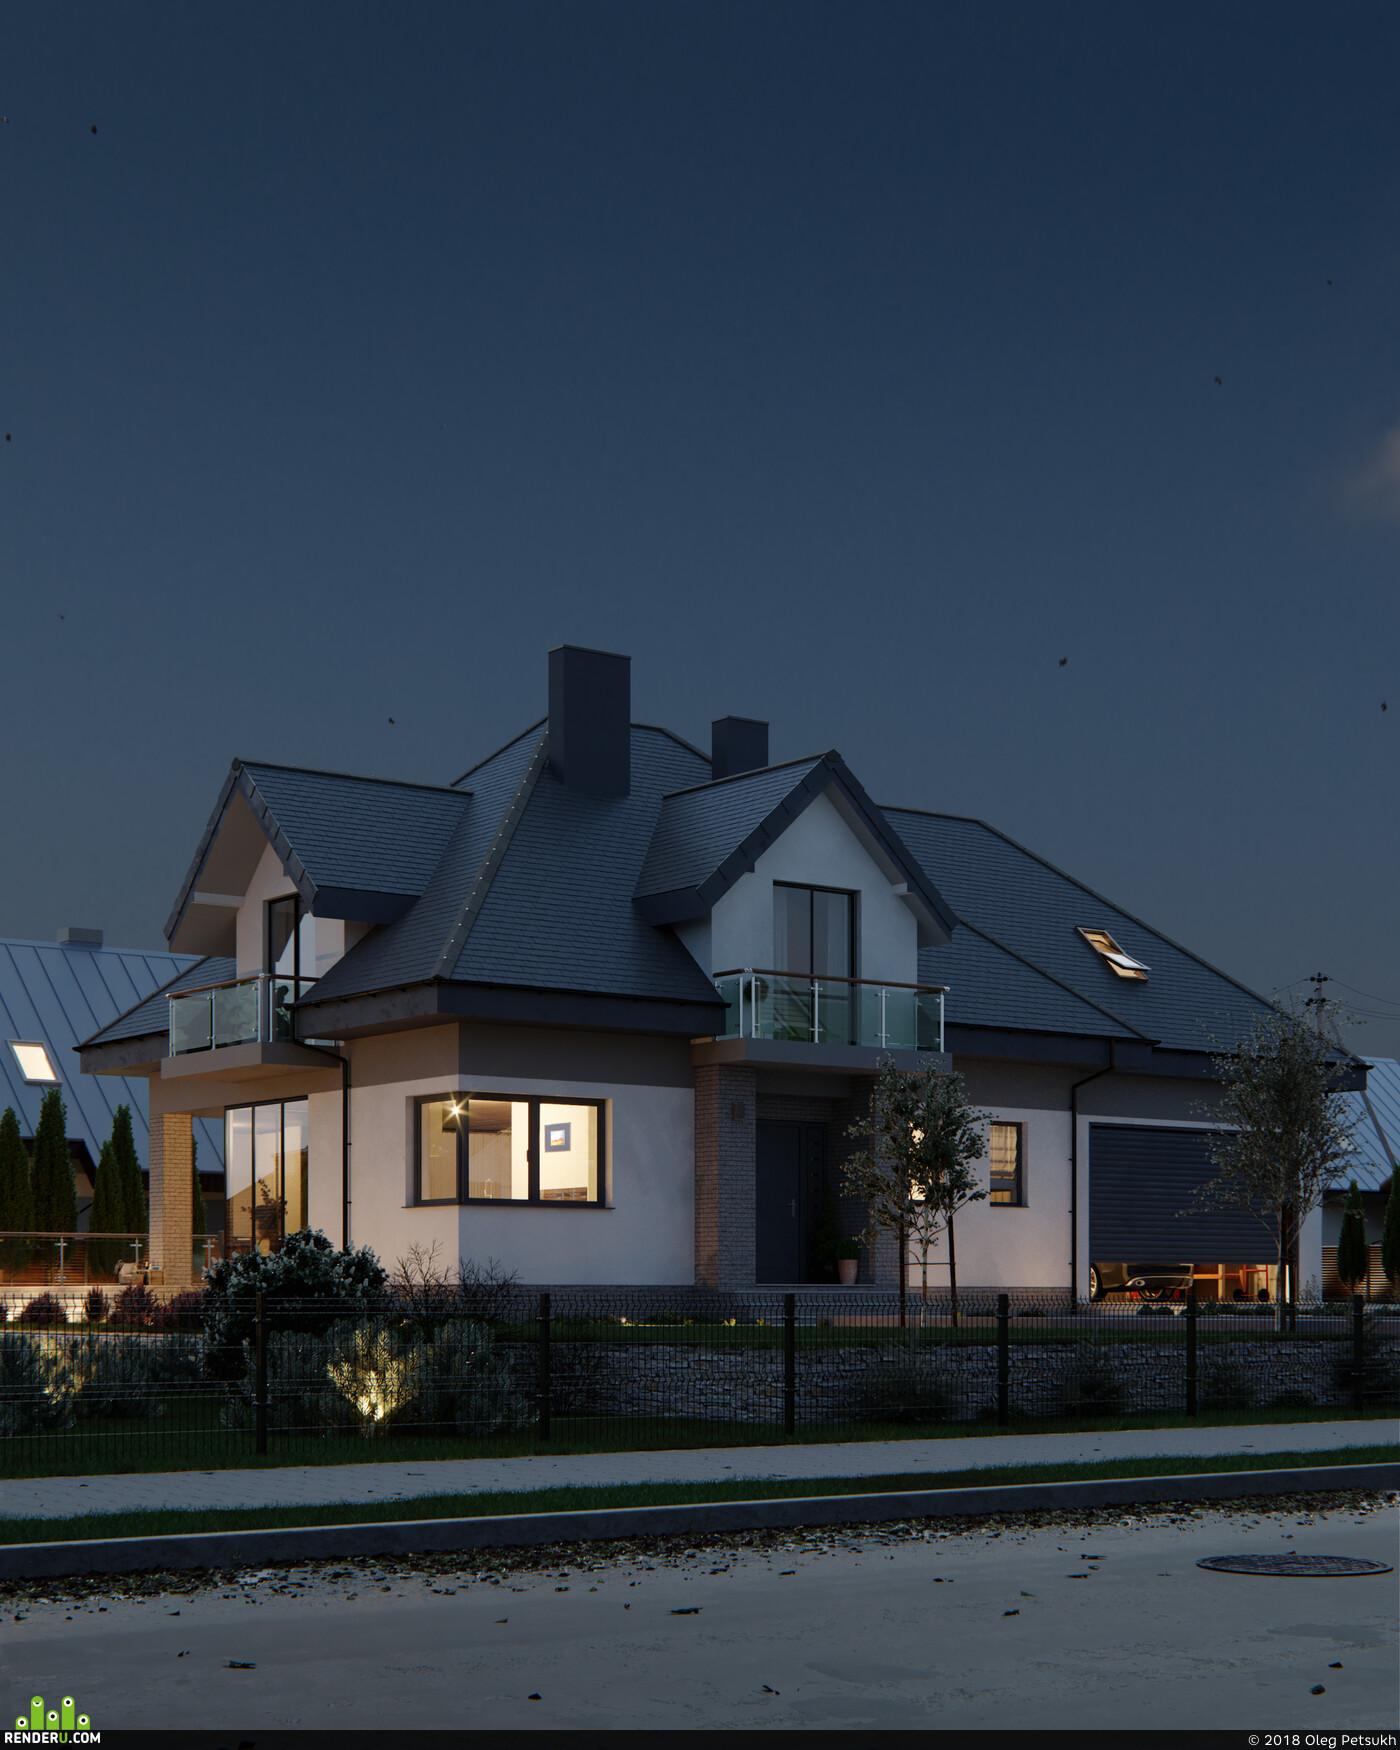 3ds Max, corona render, 3d exterior, Exterior, cgi, archviz, Adobe Photoshop